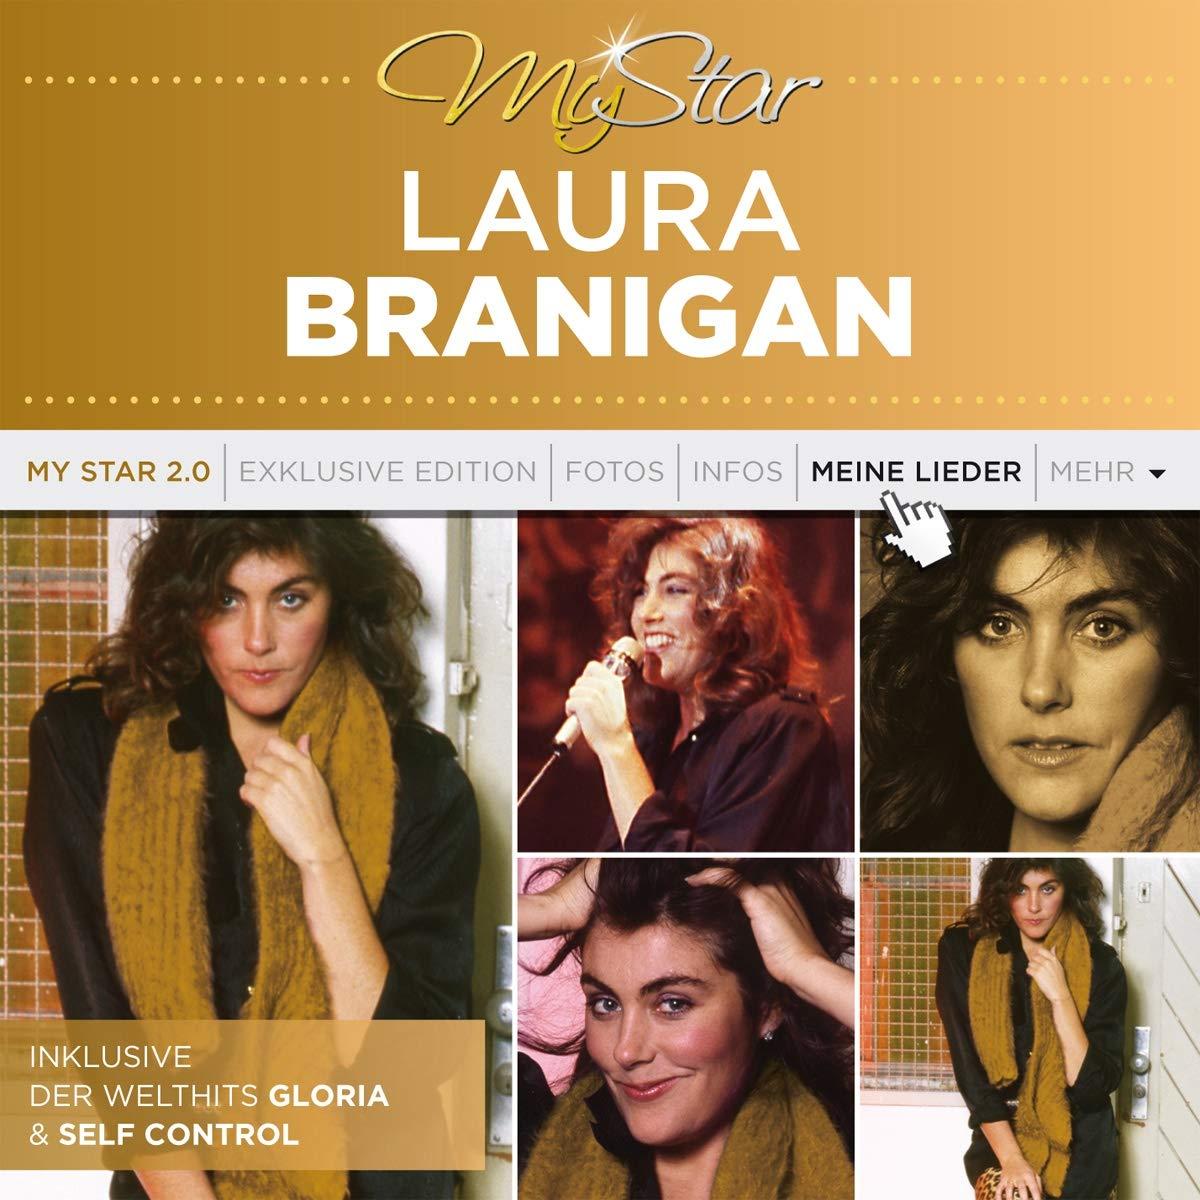 LAURA BRANIGAN - MY STAR